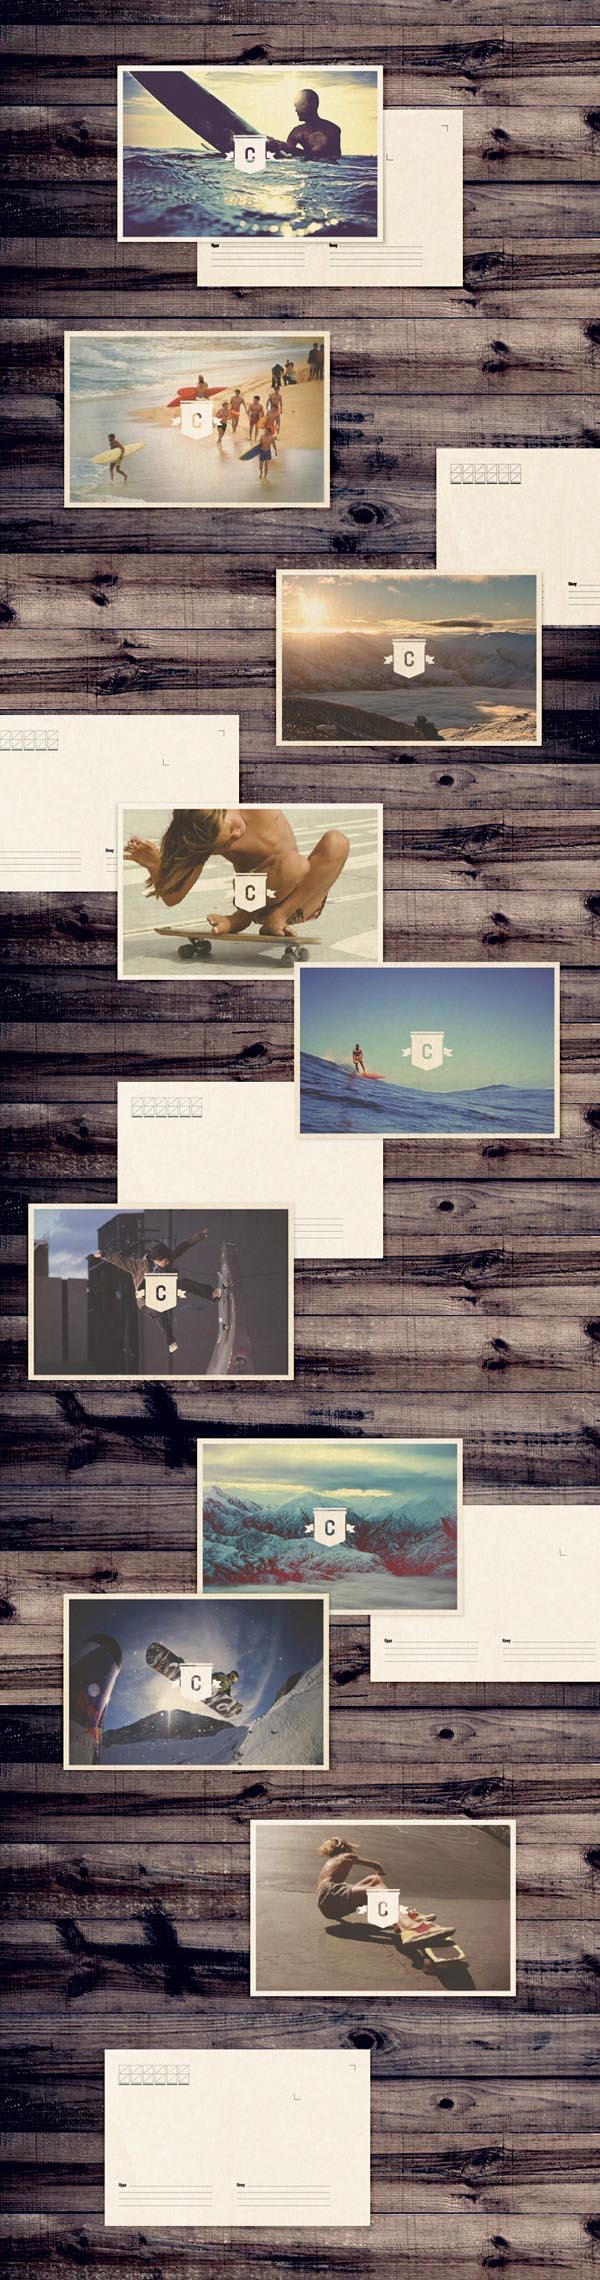 Identity Imaging by Pavel Ripley for Russian Boardshop Skvot